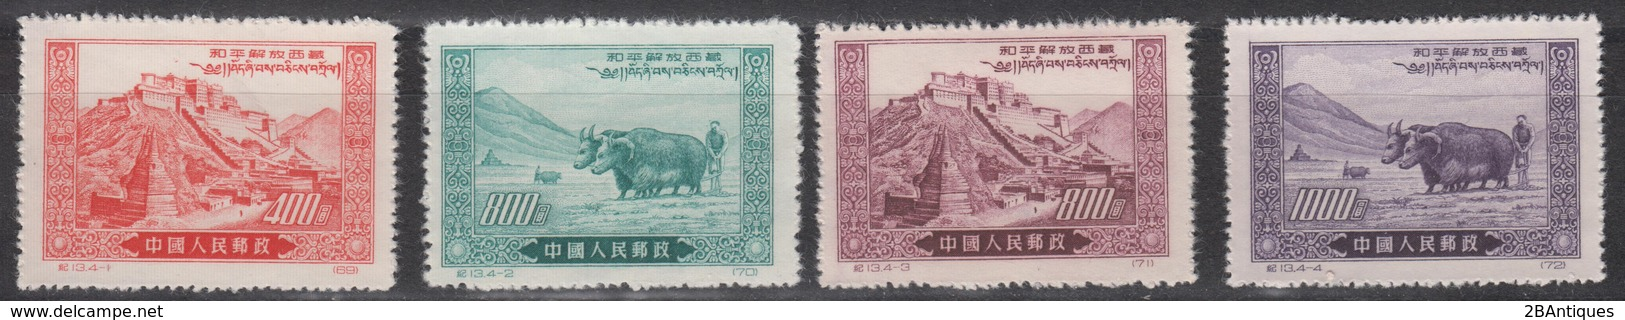 PR CHINA 1952 - Peaceful Liberation Of Tibet MNH Complete Set - Nuovi